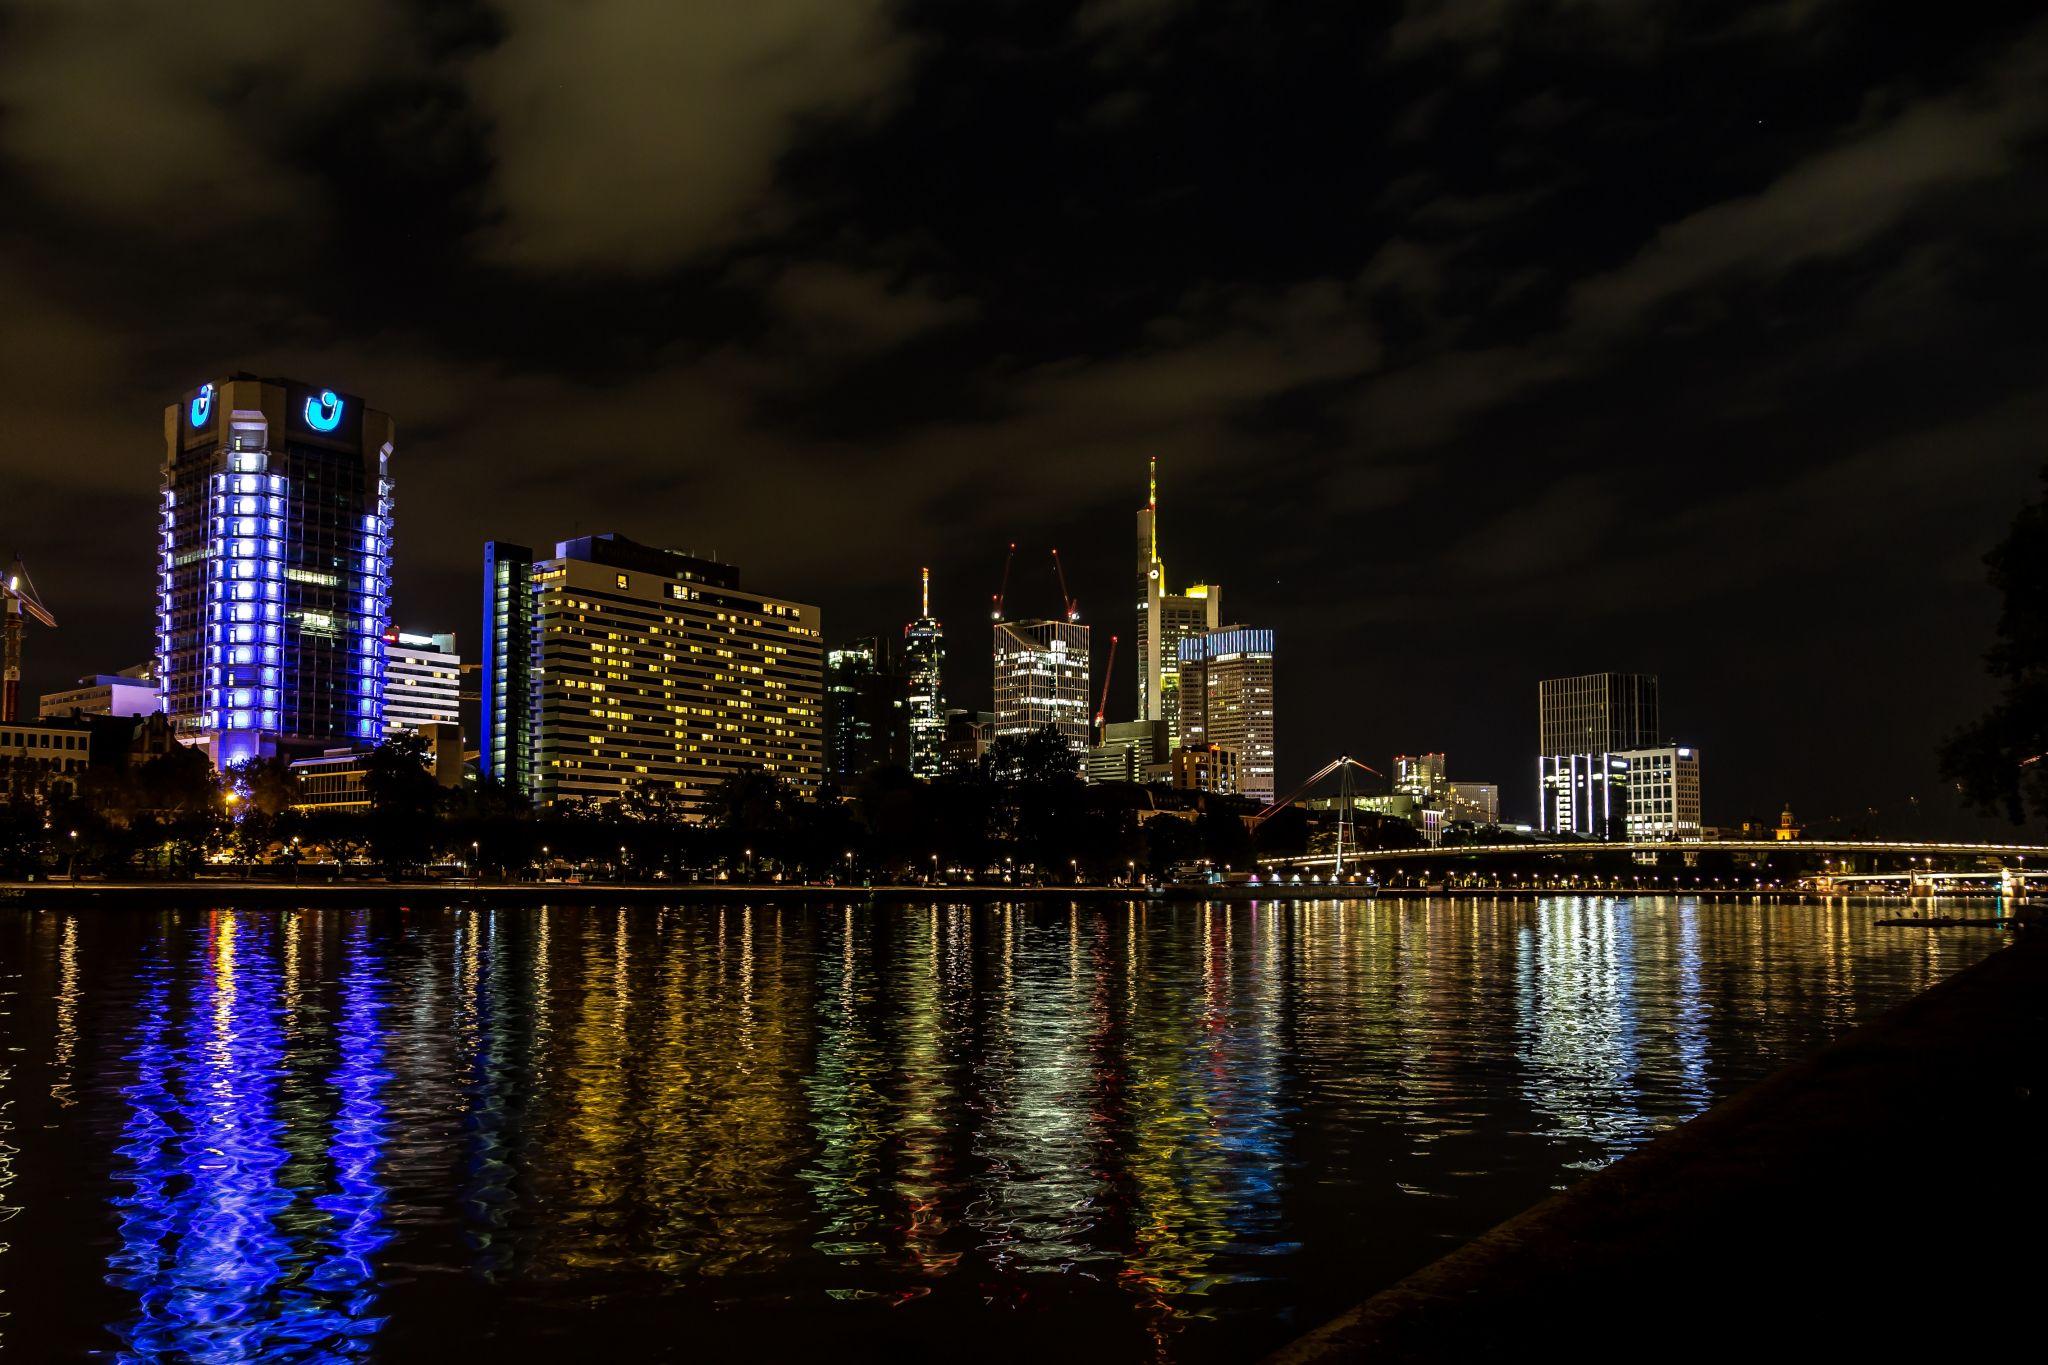 Mainufer Frankfurt, Germany